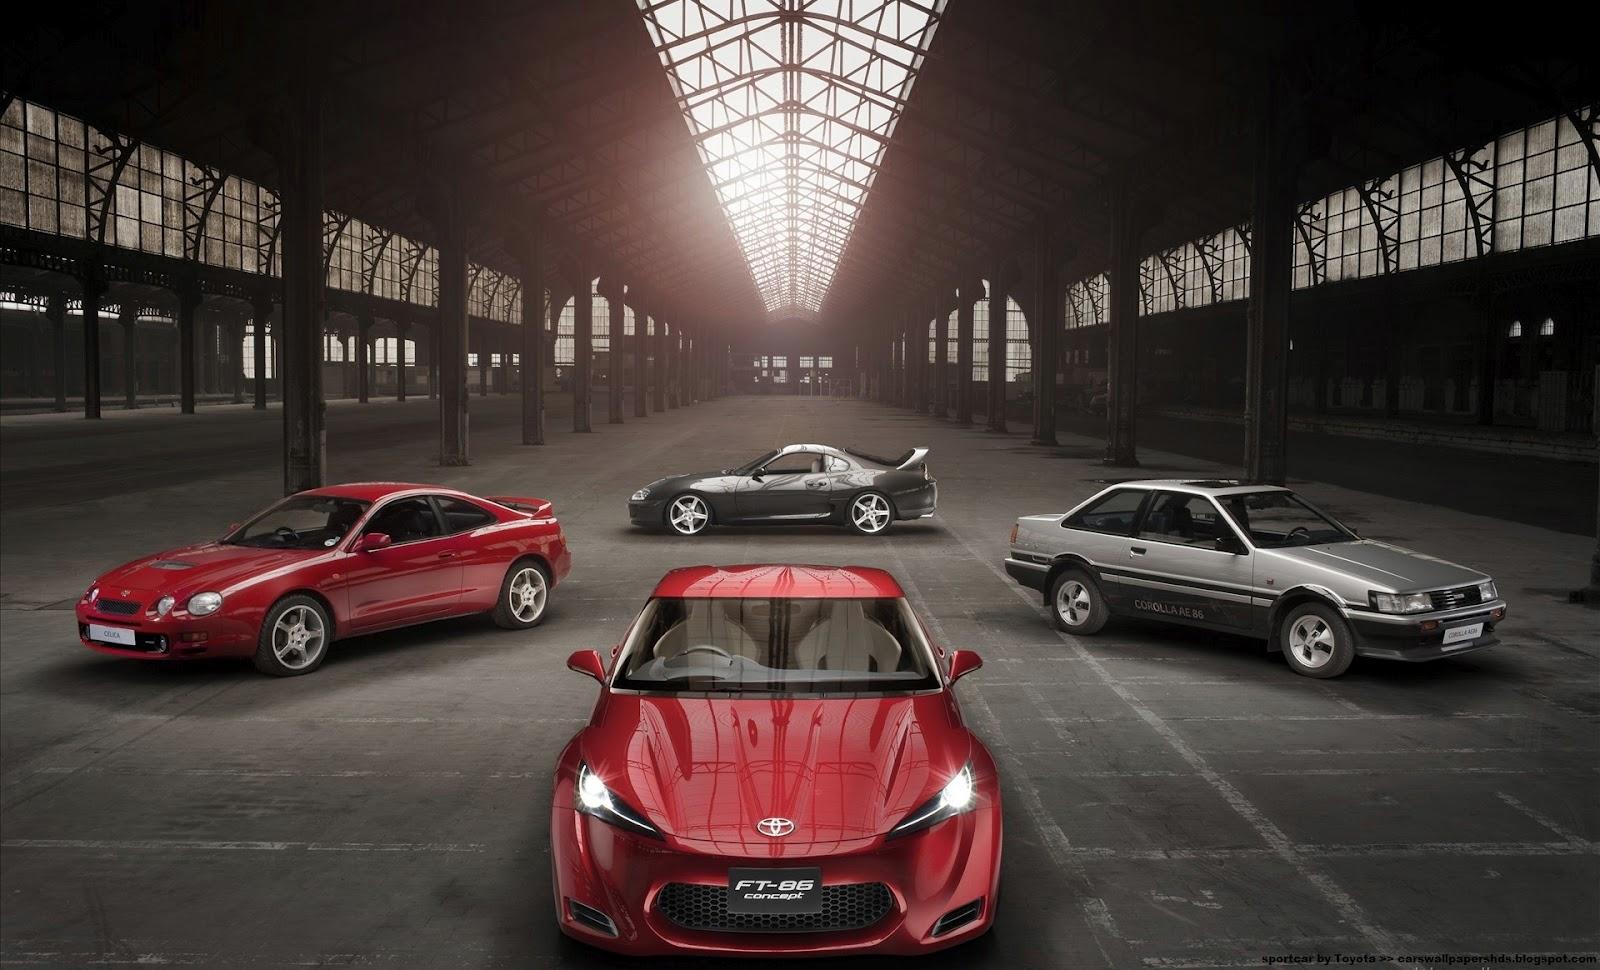 https://2.bp.blogspot.com/-73EBYADww-I/UAQbUZ36NcI/AAAAAAAAADI/TOV7B0vc3V8/s1600/2011-toyota-ft-86-sports-concept-HD-Car-wallpapers.jpg